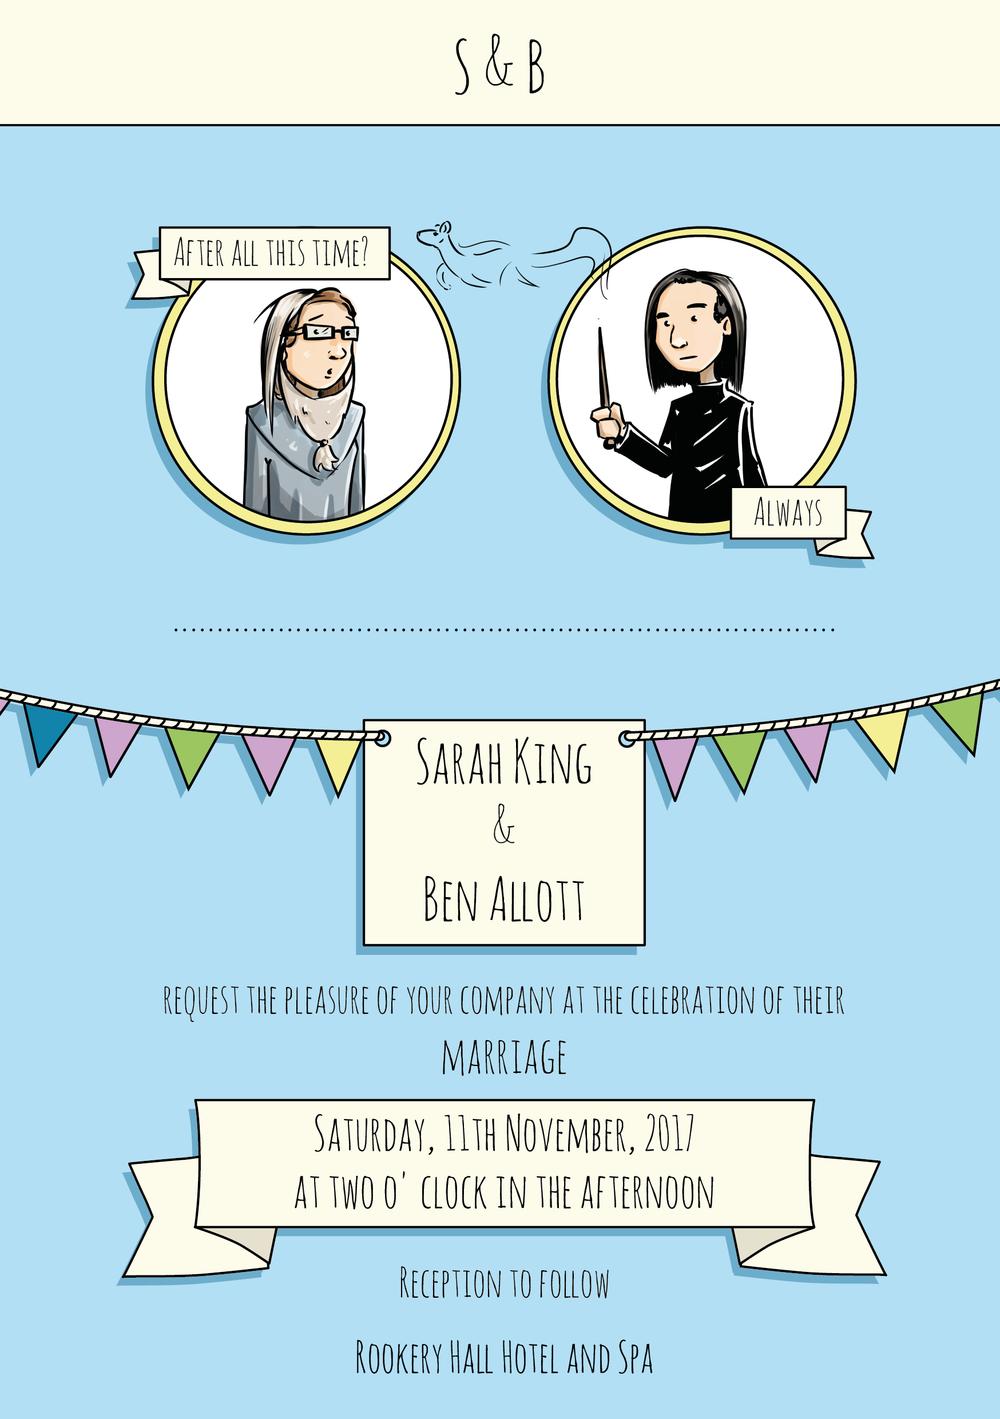 Ben and Sarah invitation layout 3-01.png